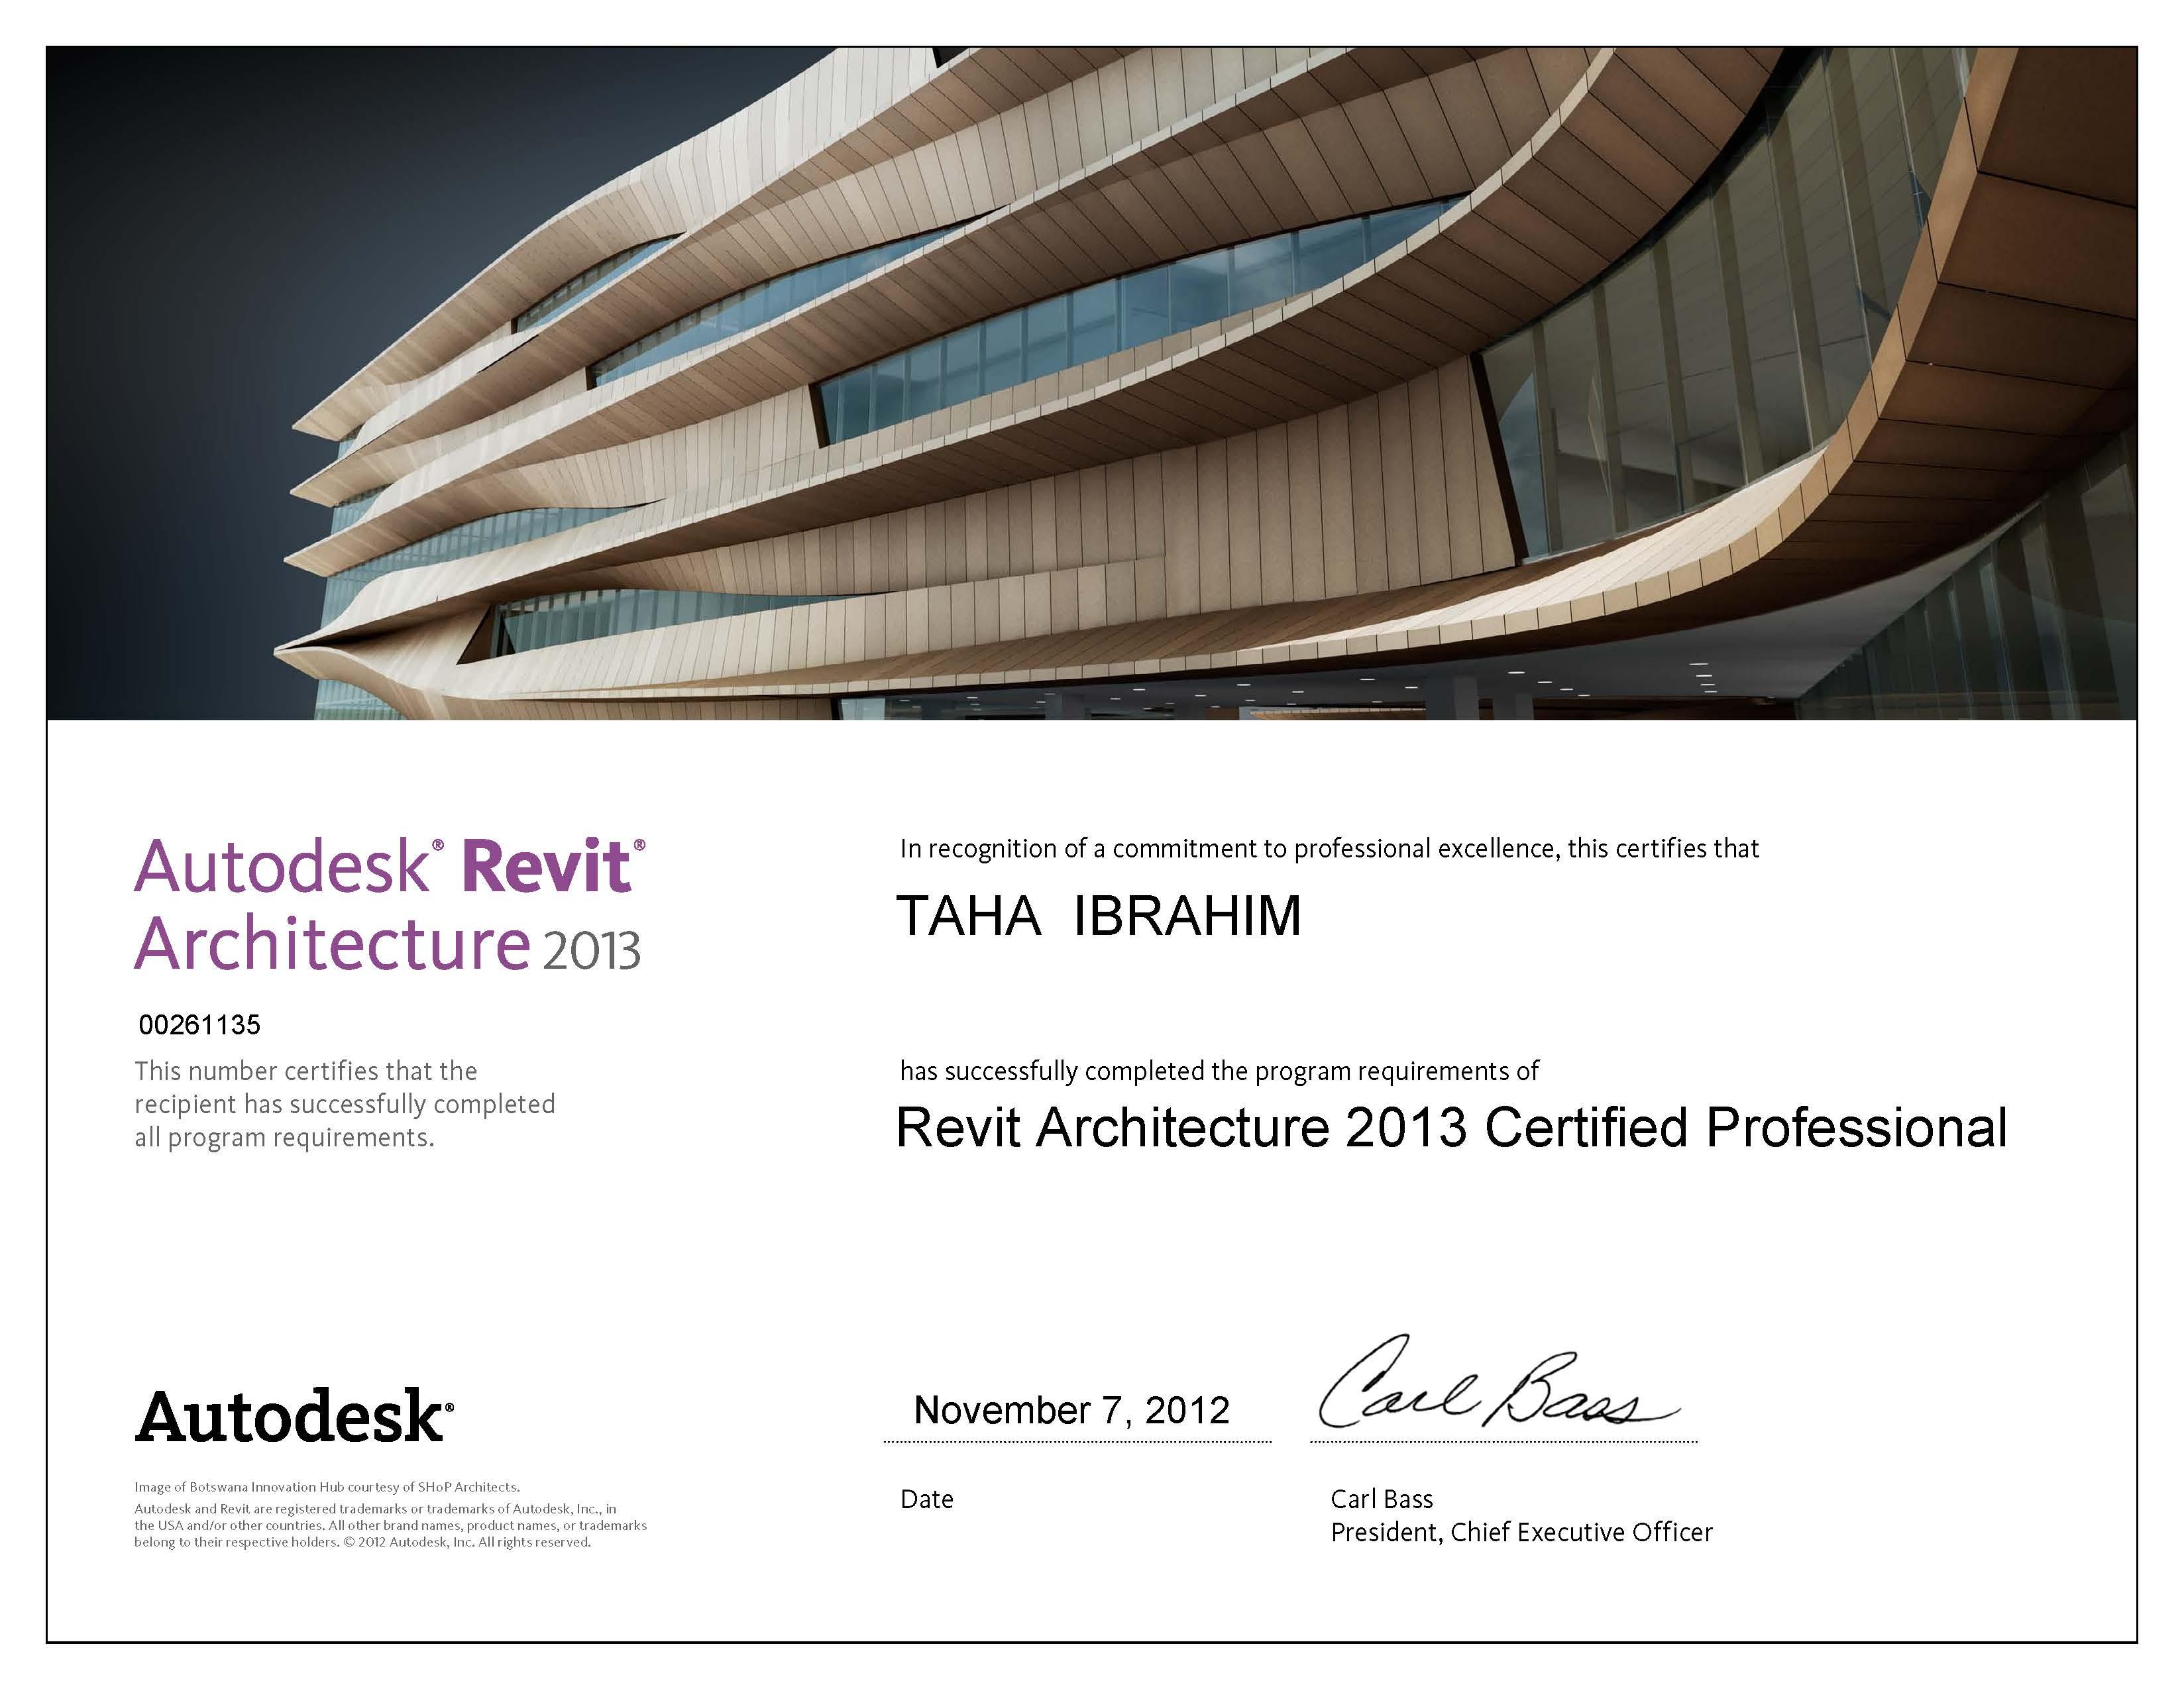 Taha awad allah el sayed ibrahimphotos certification of revit architecture 2013 professional 1betcityfo Choice Image